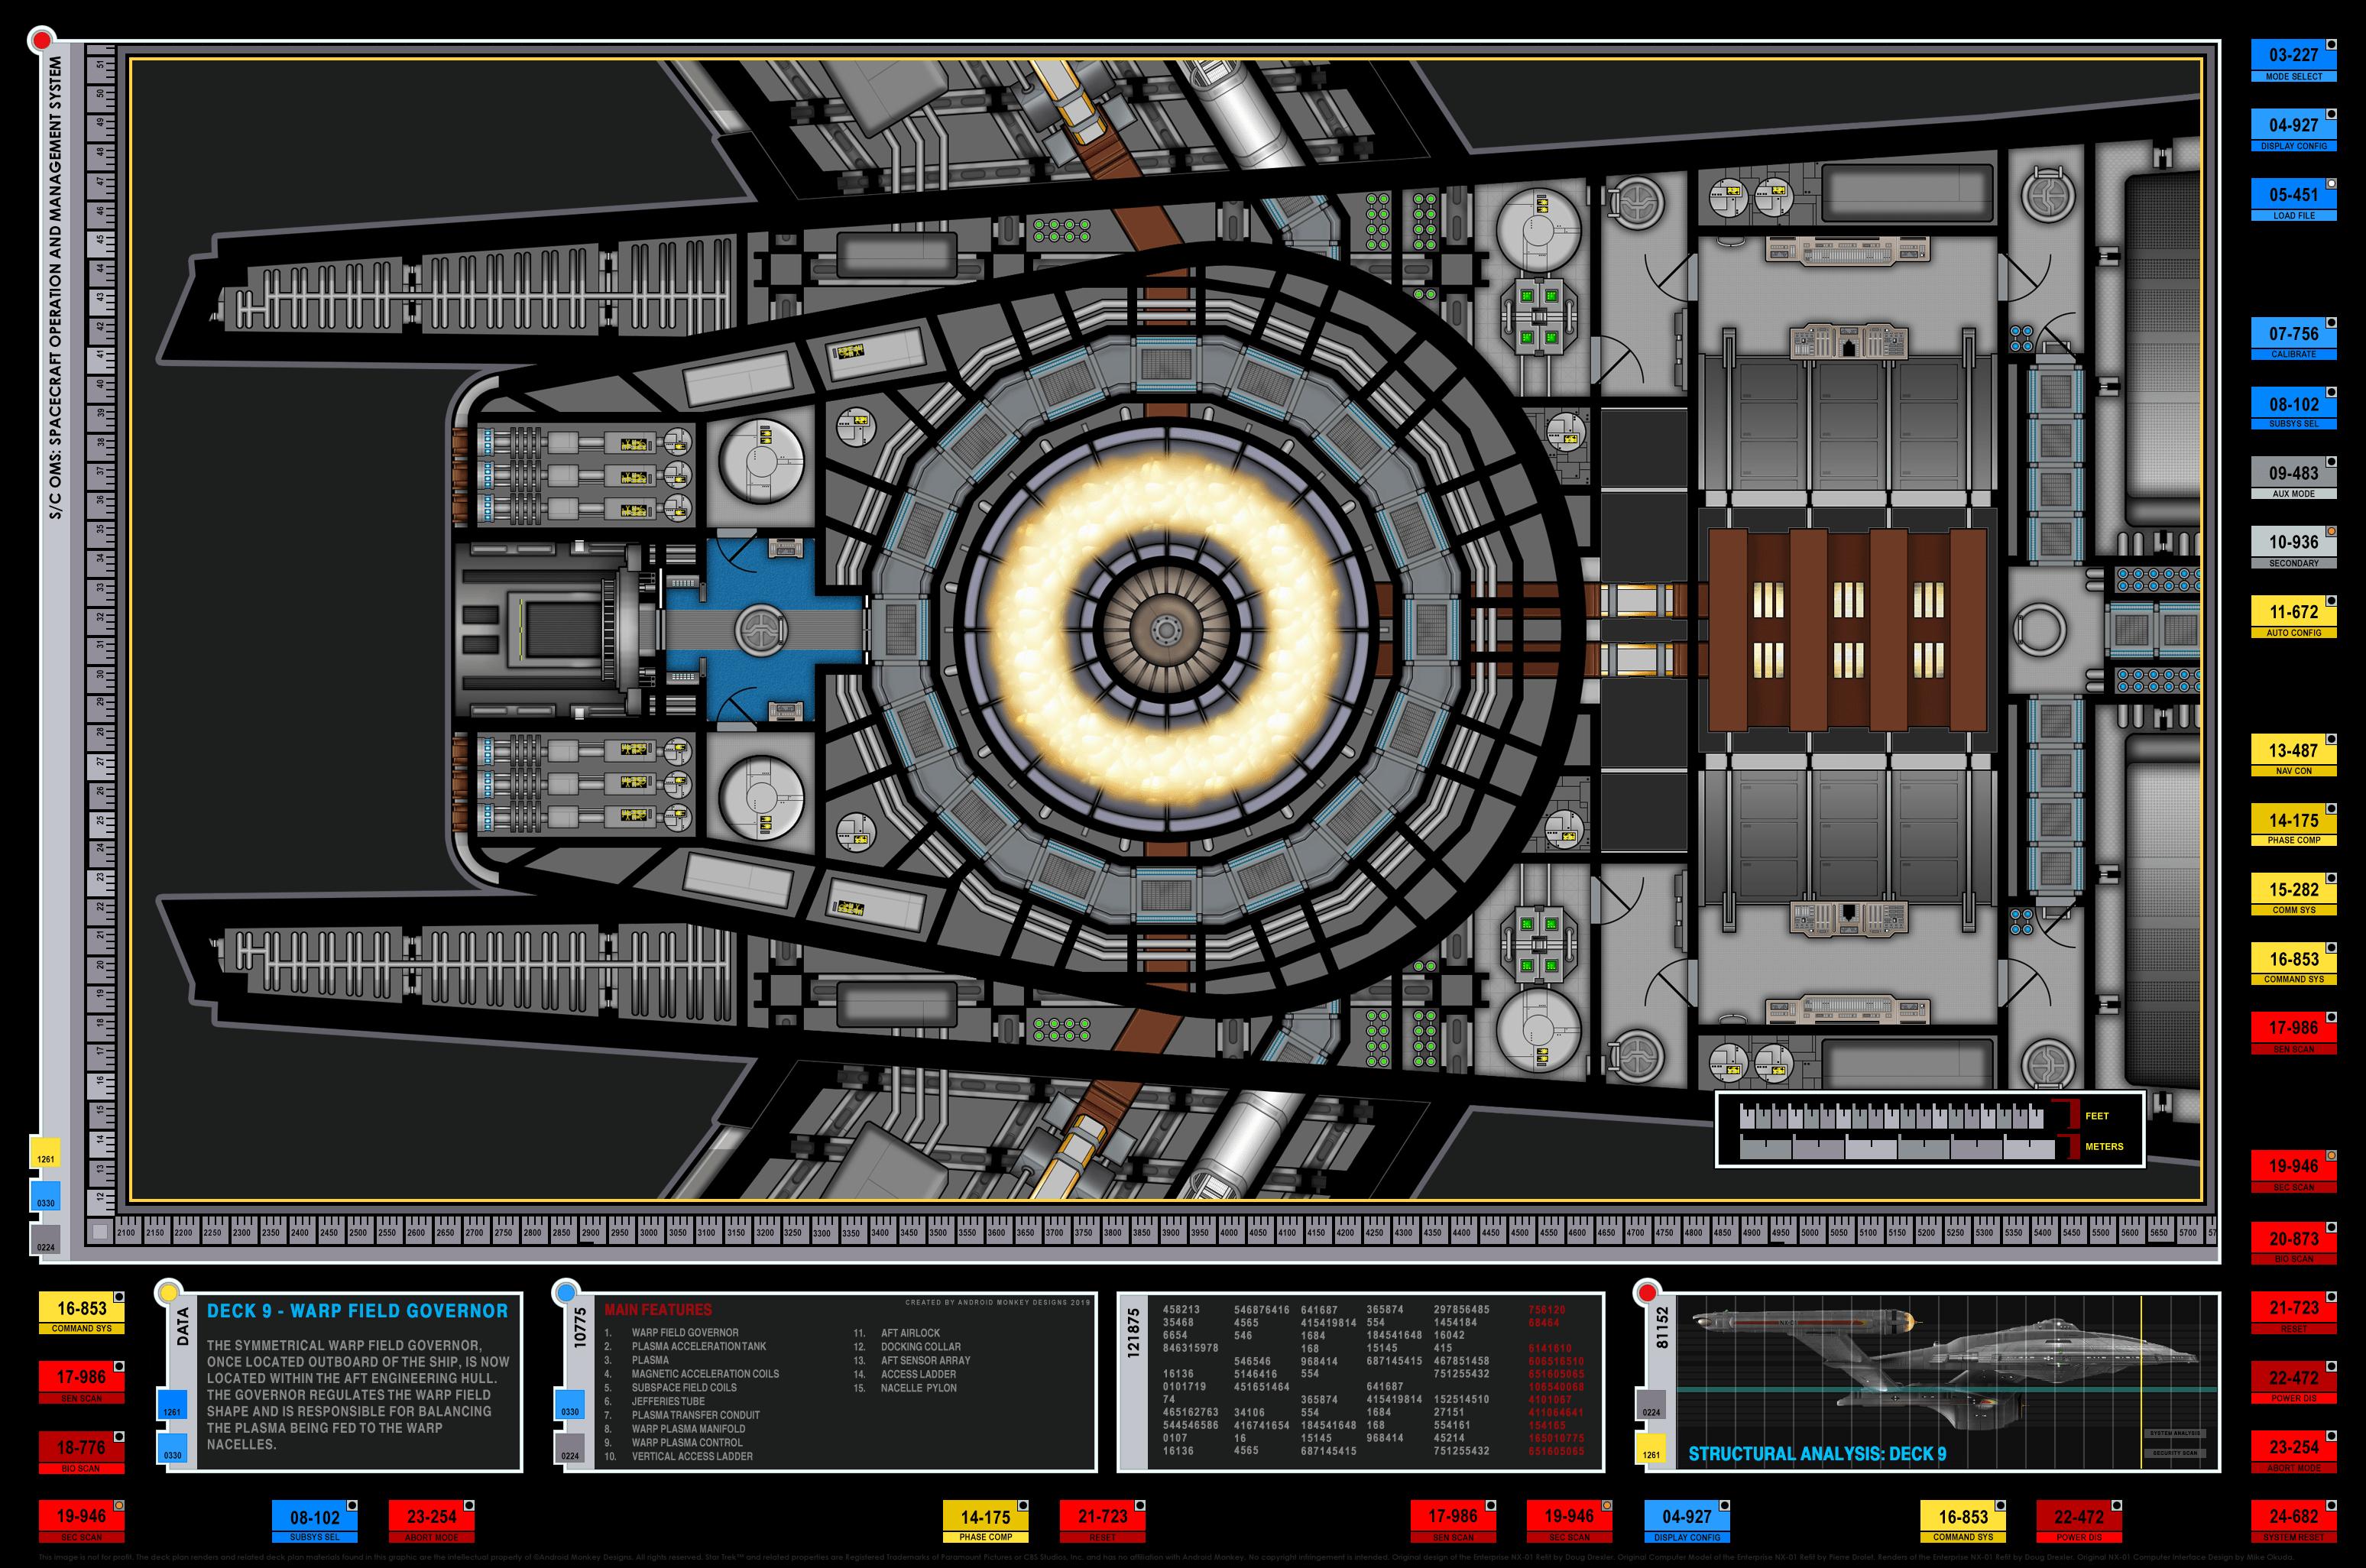 Enterprise Nx 01 Refit Warp Field Governor Detail Plan